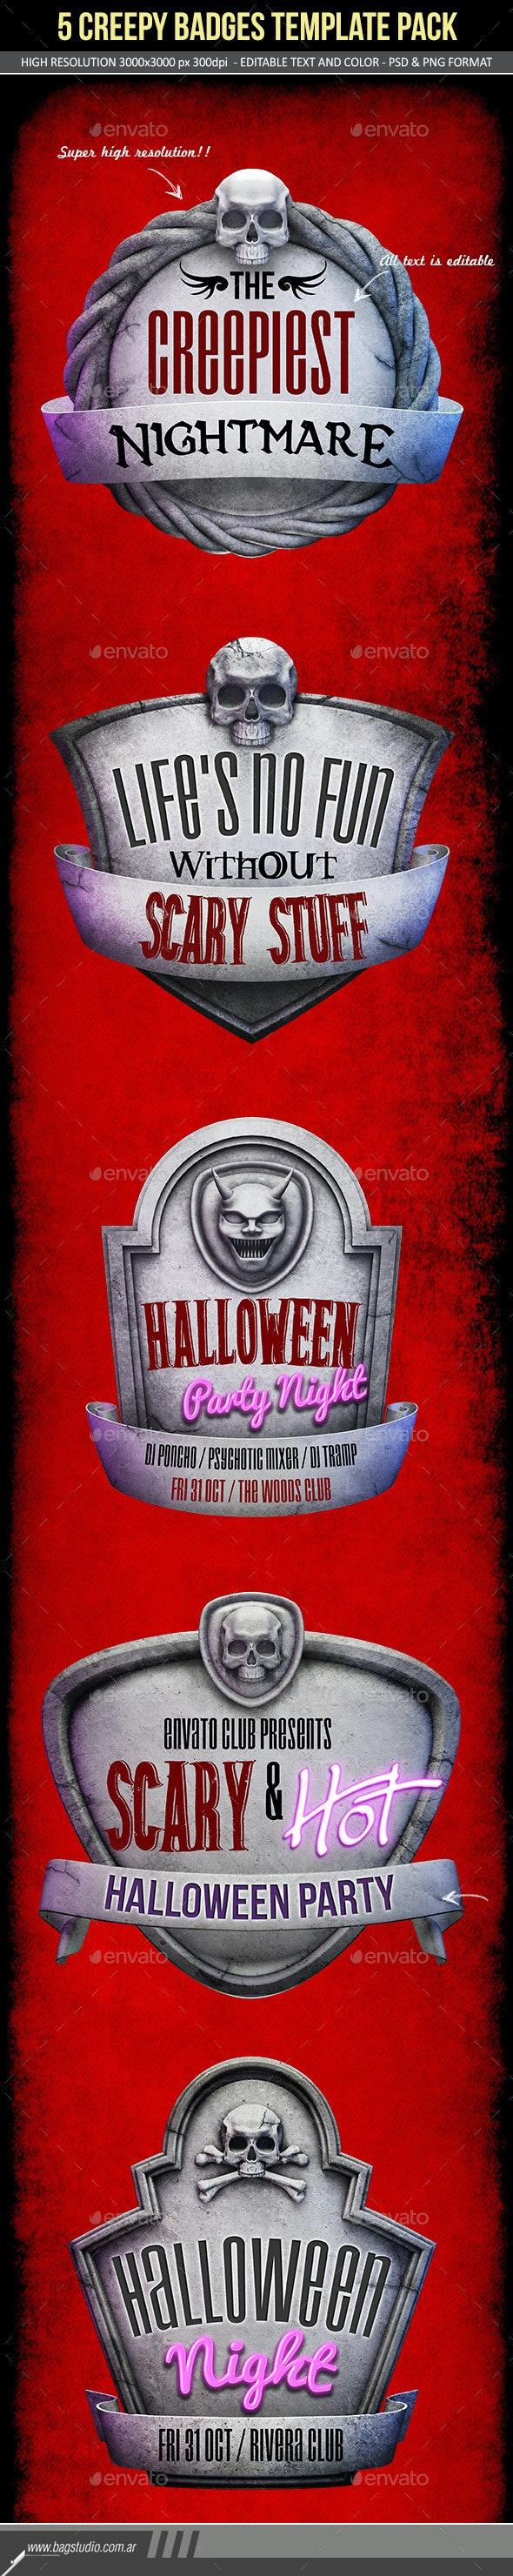 Creepy Stone Halloween Badges Pack - Abstract 3D Renders